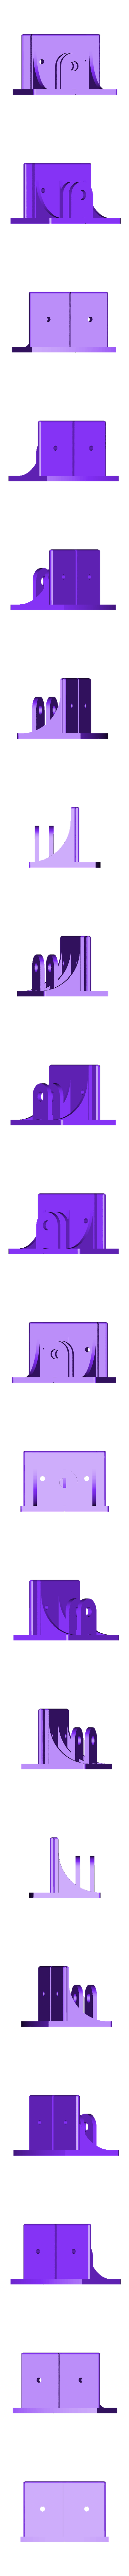 NSKB-80-bottom-v2.stl Télécharger fichier STL gratuit Pièces 3D pour l'imprimante Ceramic DIY • Objet à imprimer en 3D, fgeer